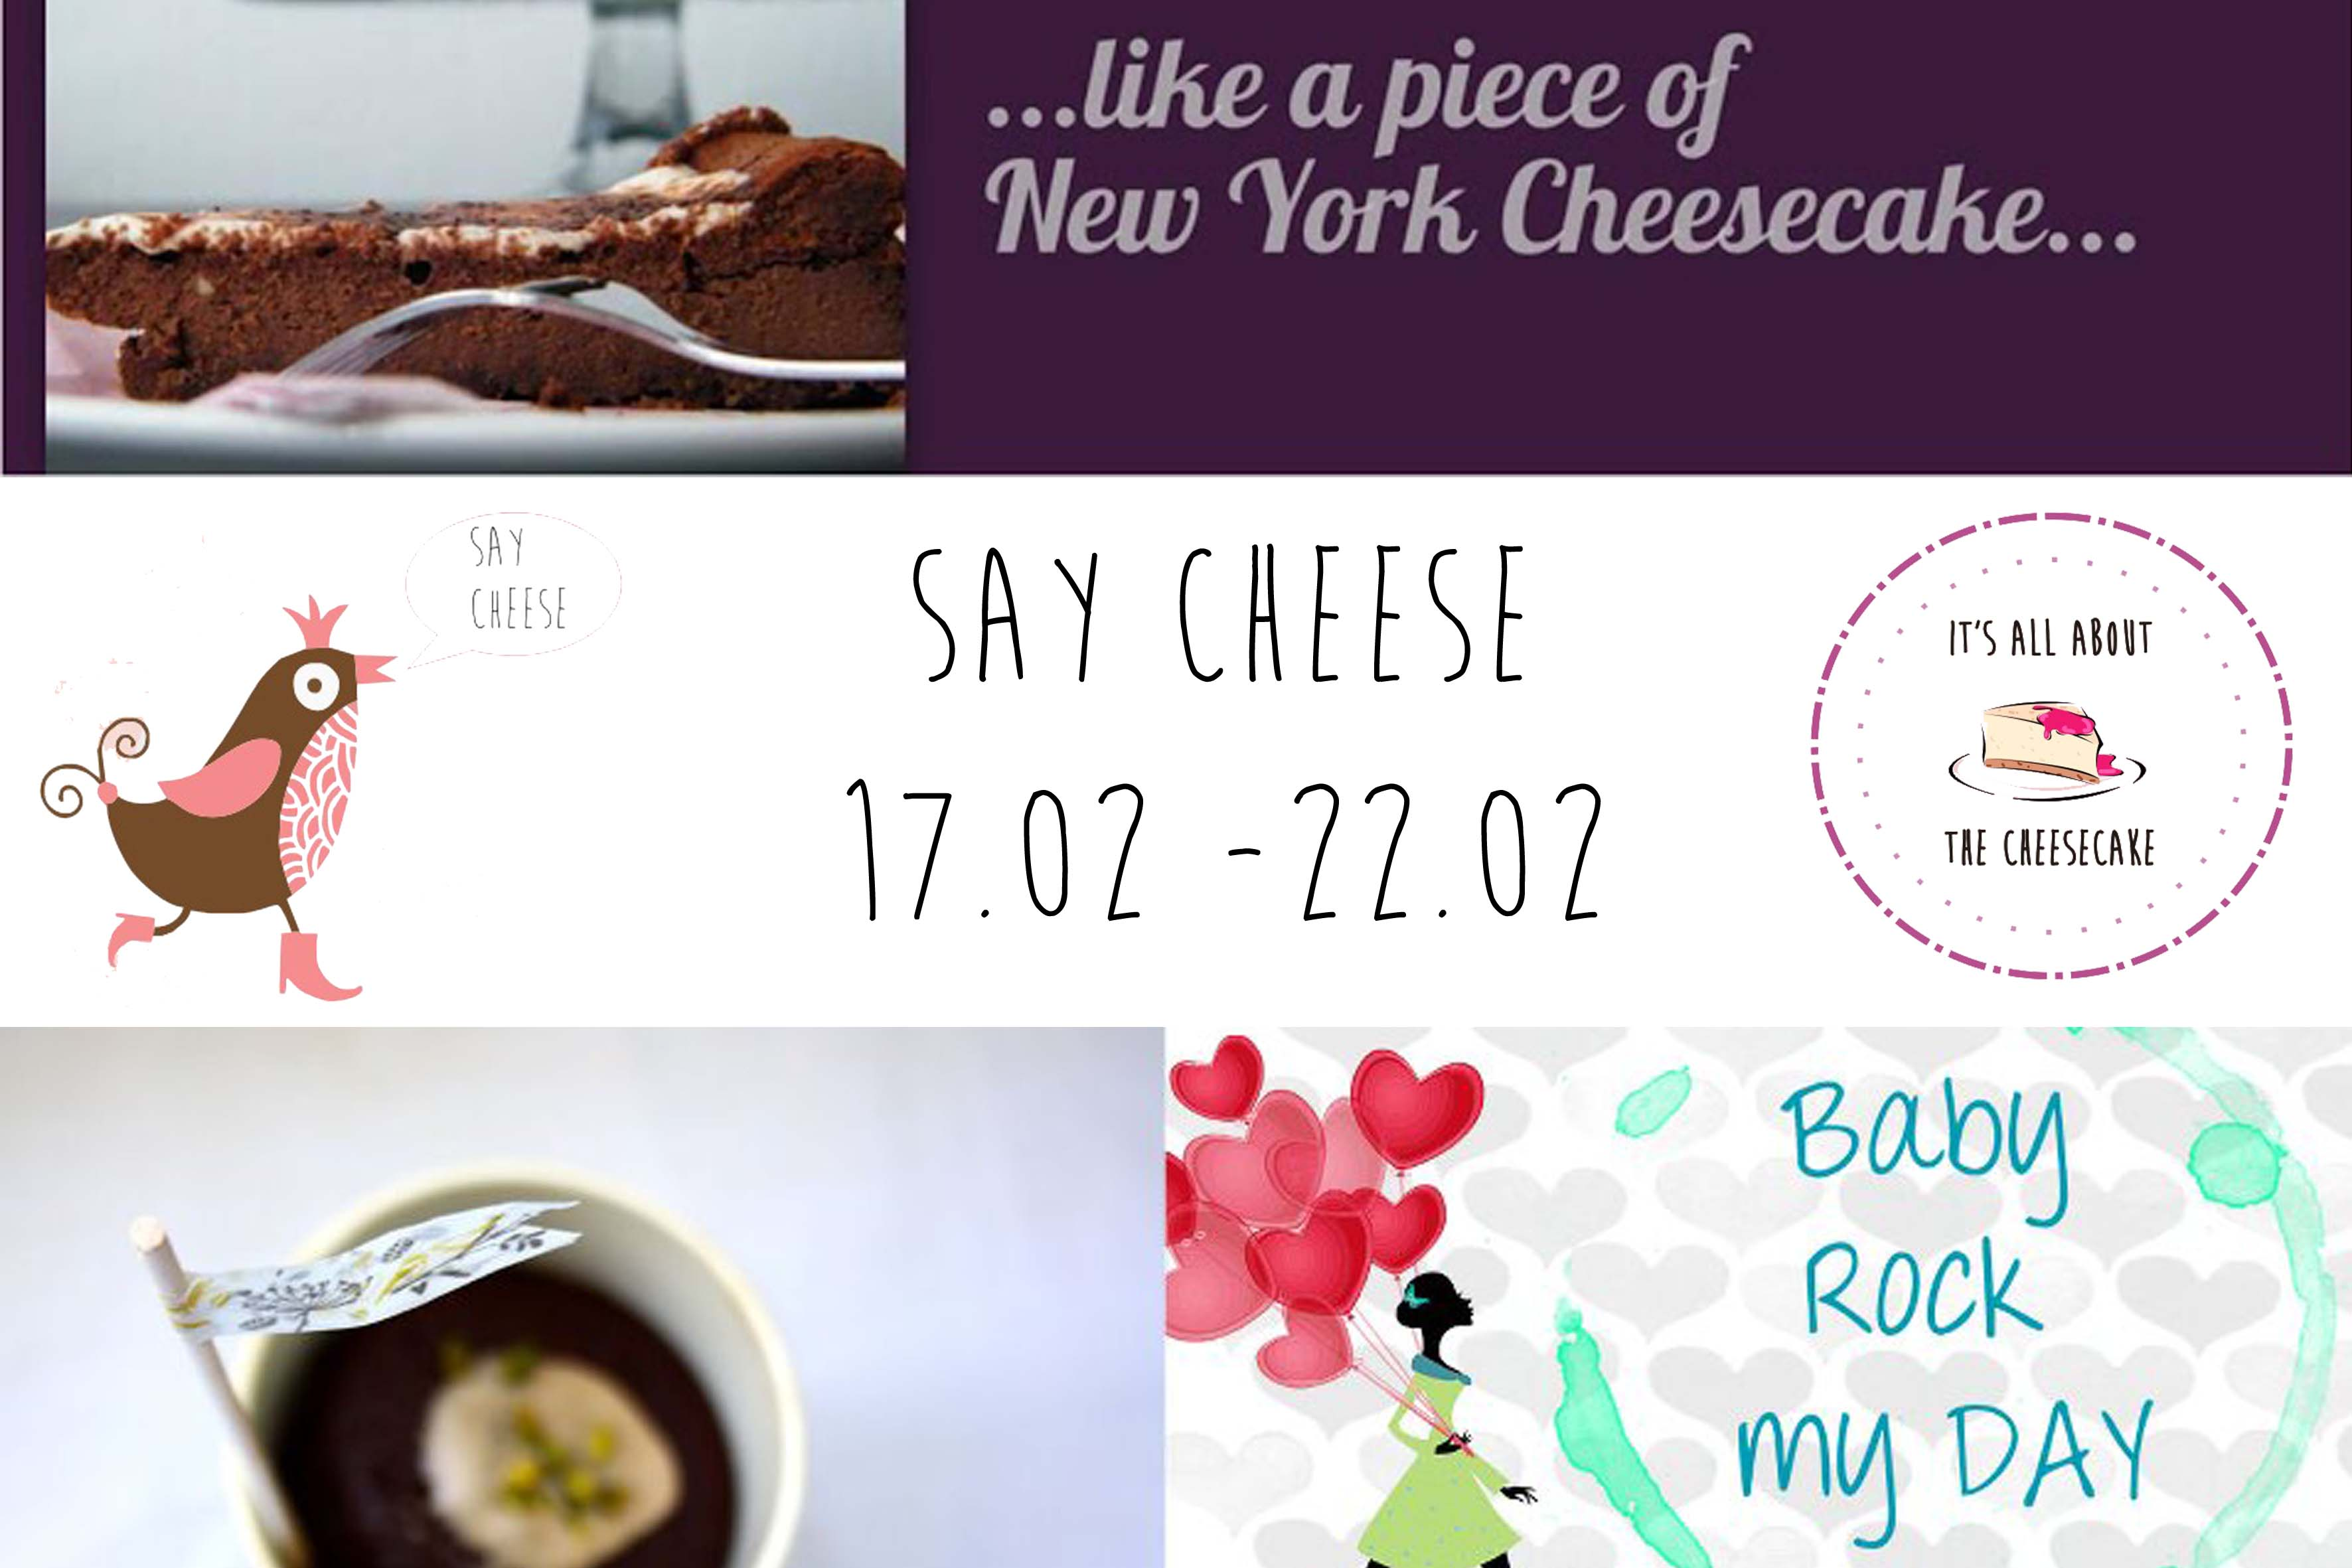 Chocolate-Caramel-Oreo-Cheesecake by http://babyrockmyday.com/chocolate-caramel-oreo-cheesecake/